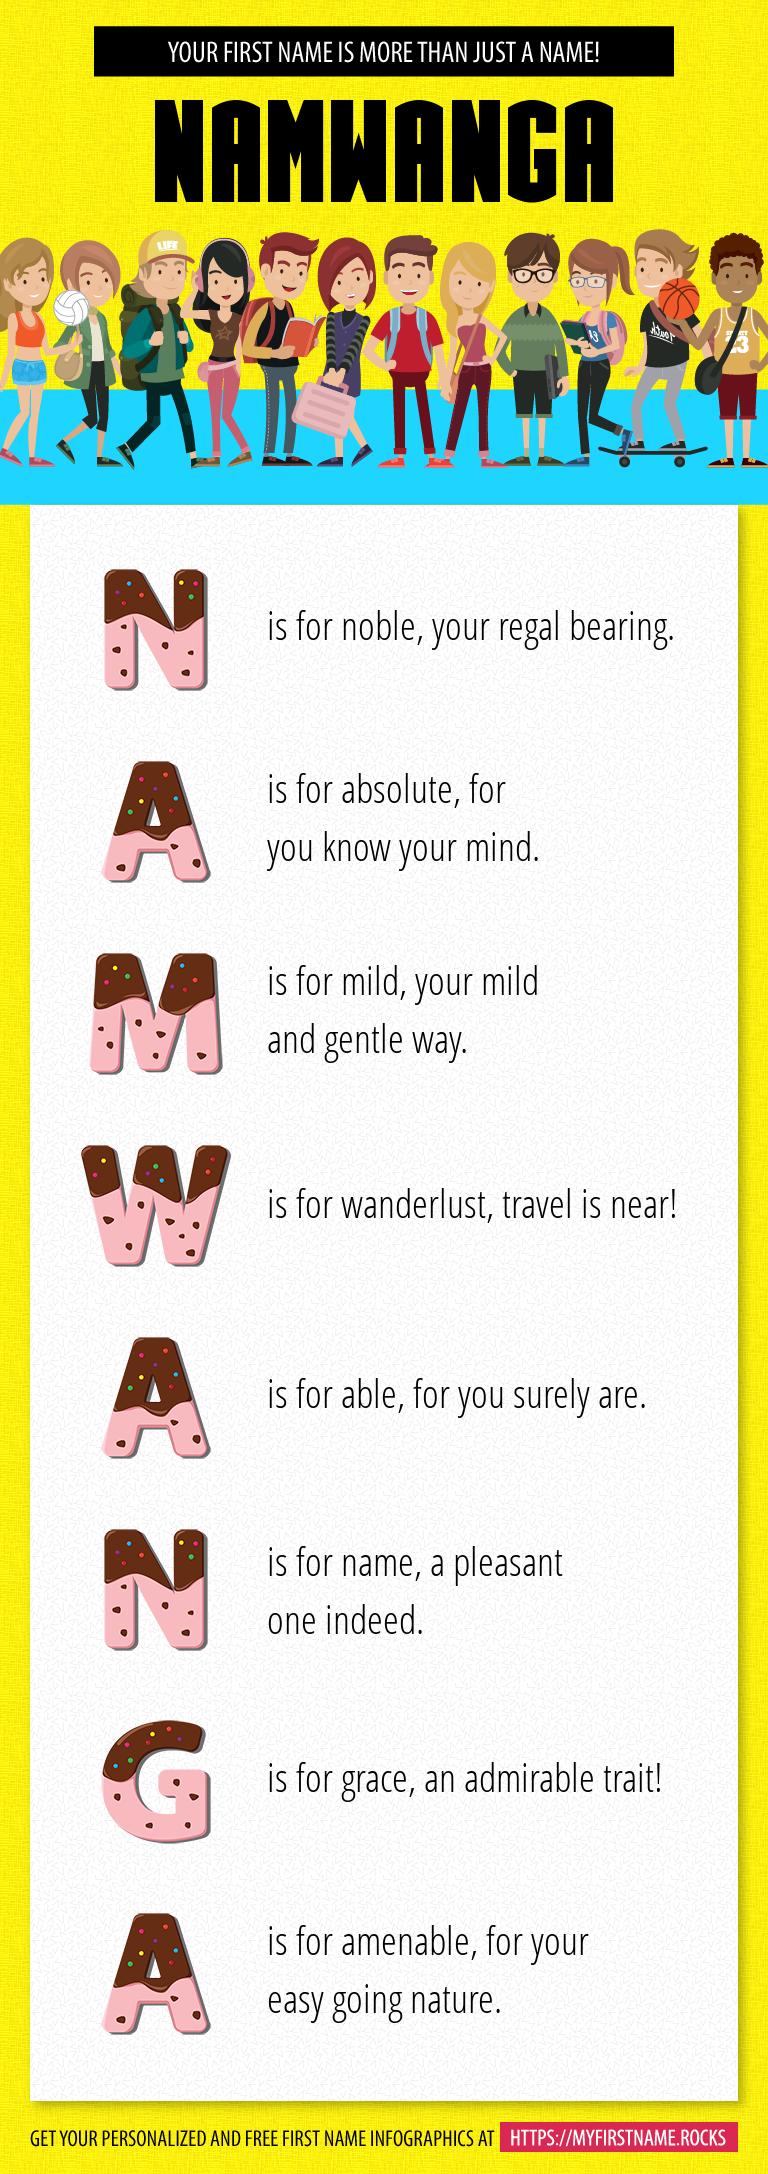 Namwanga Infographics